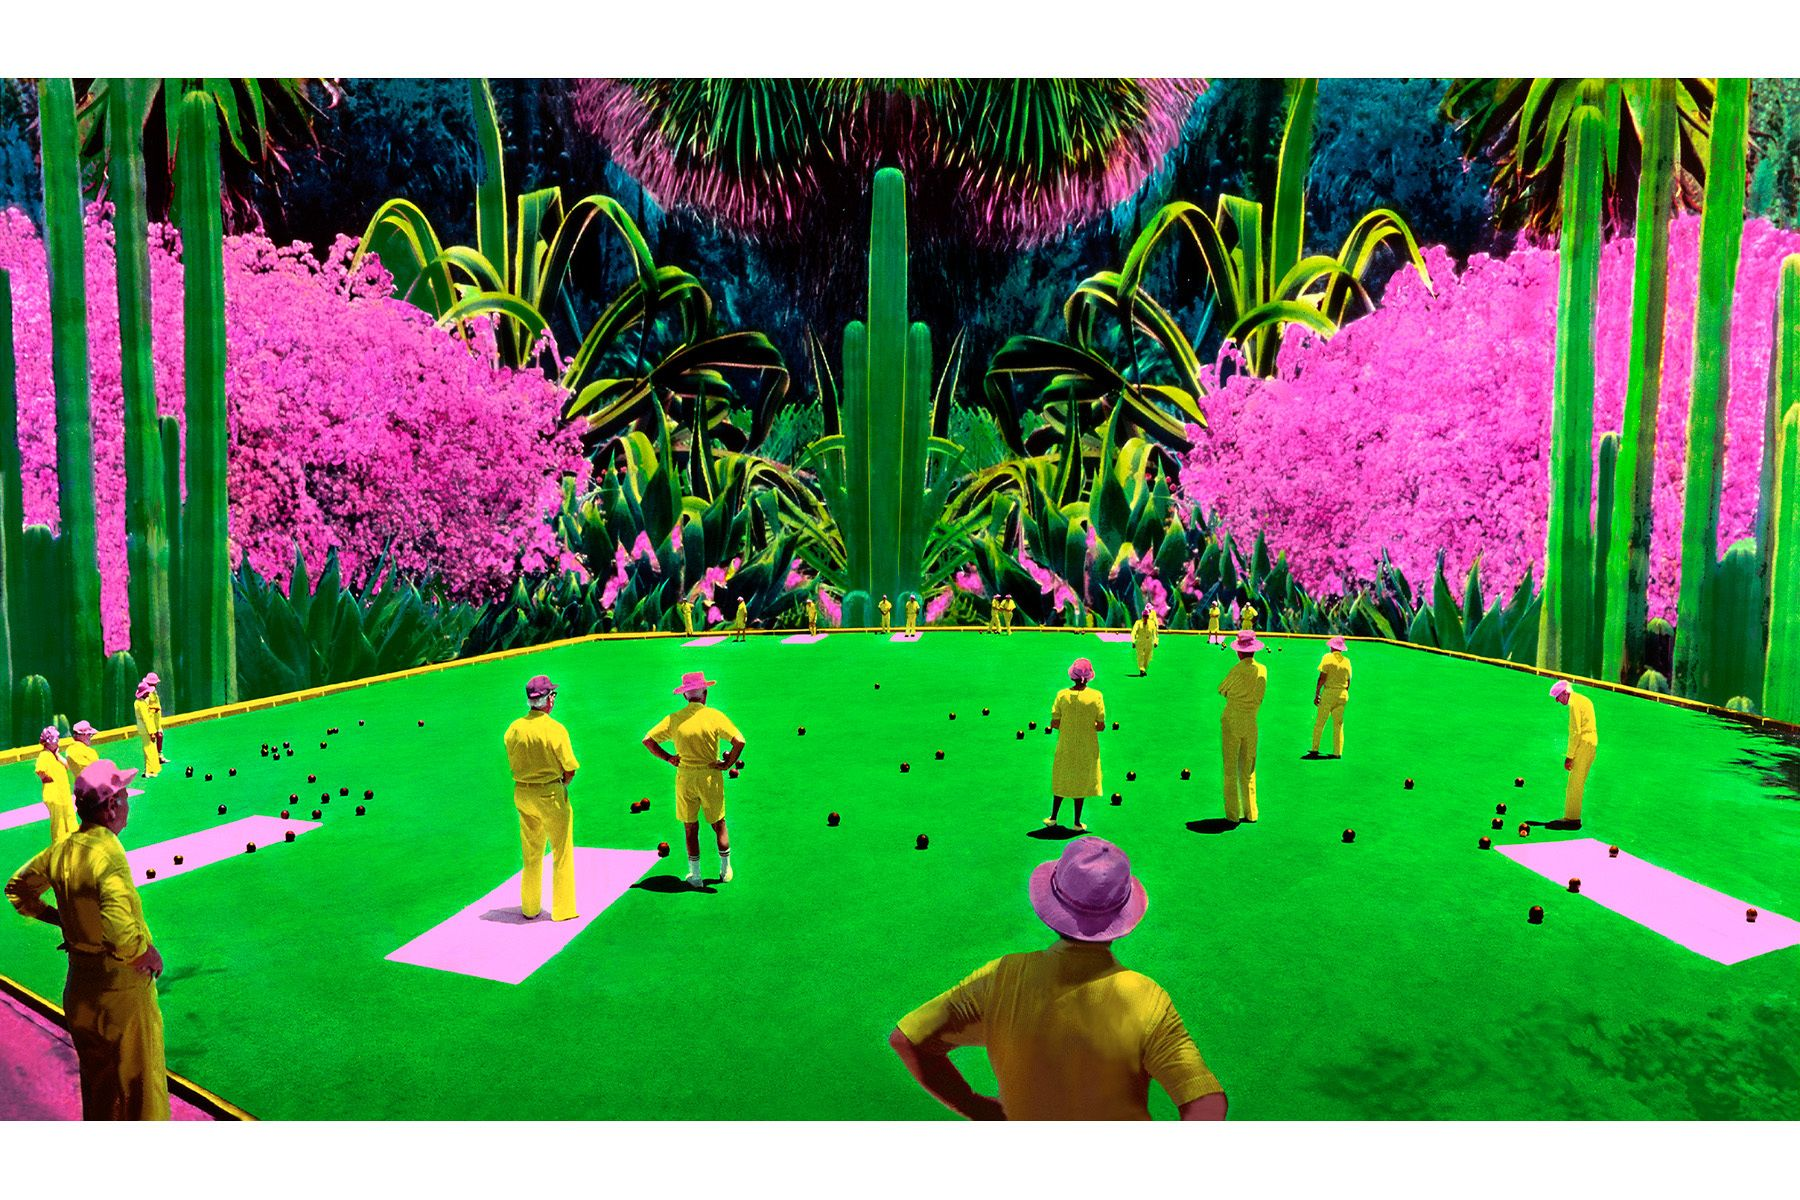 3_0_46_1d_gottlieb_lawn_bowlers_life.jpg